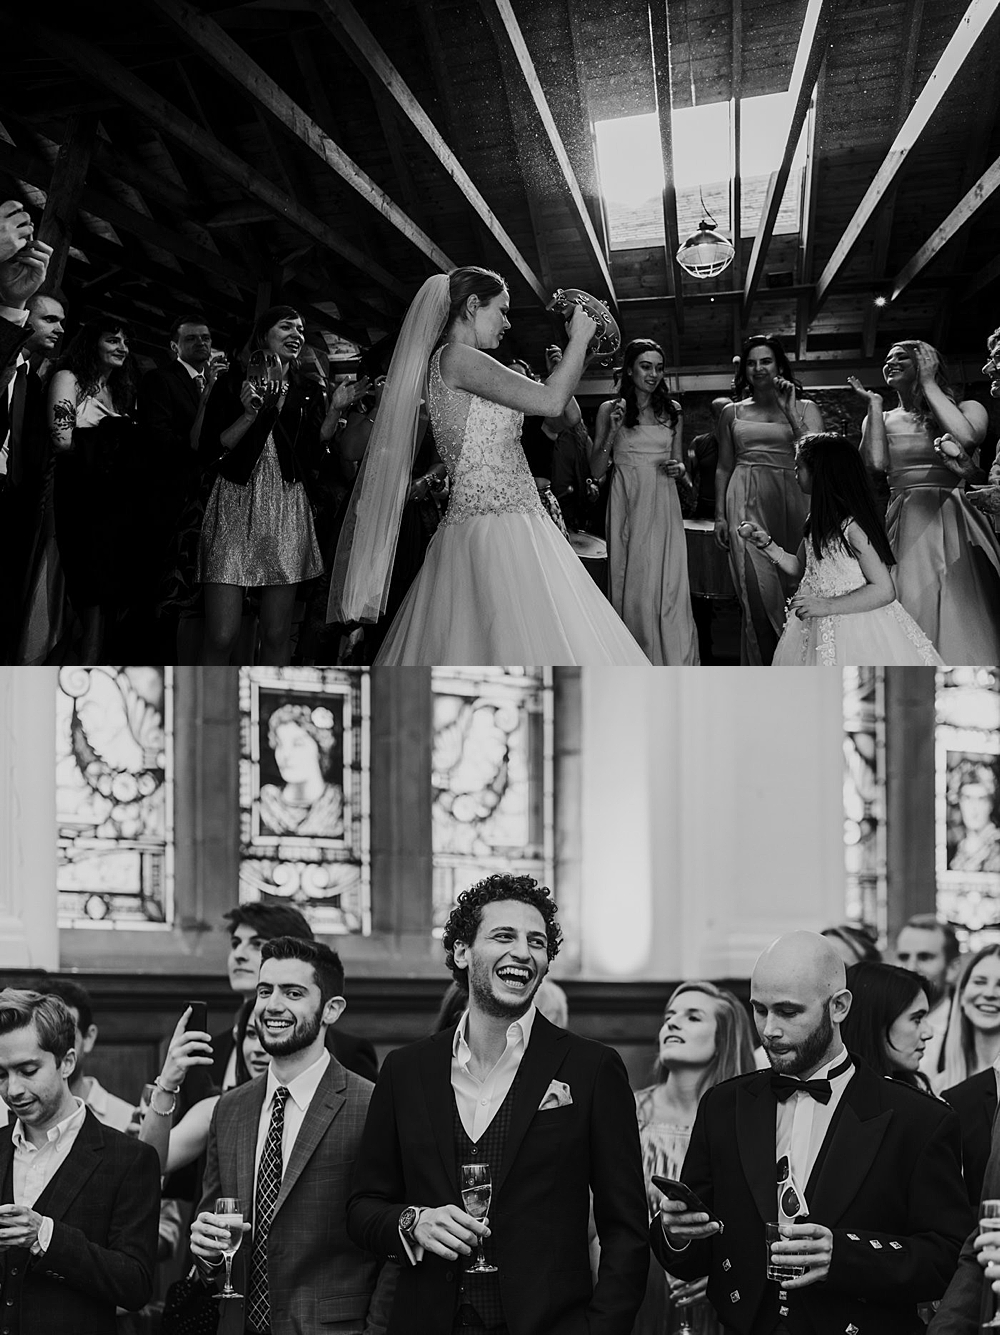 Scottish weddings dancing & fun 0025.jpg